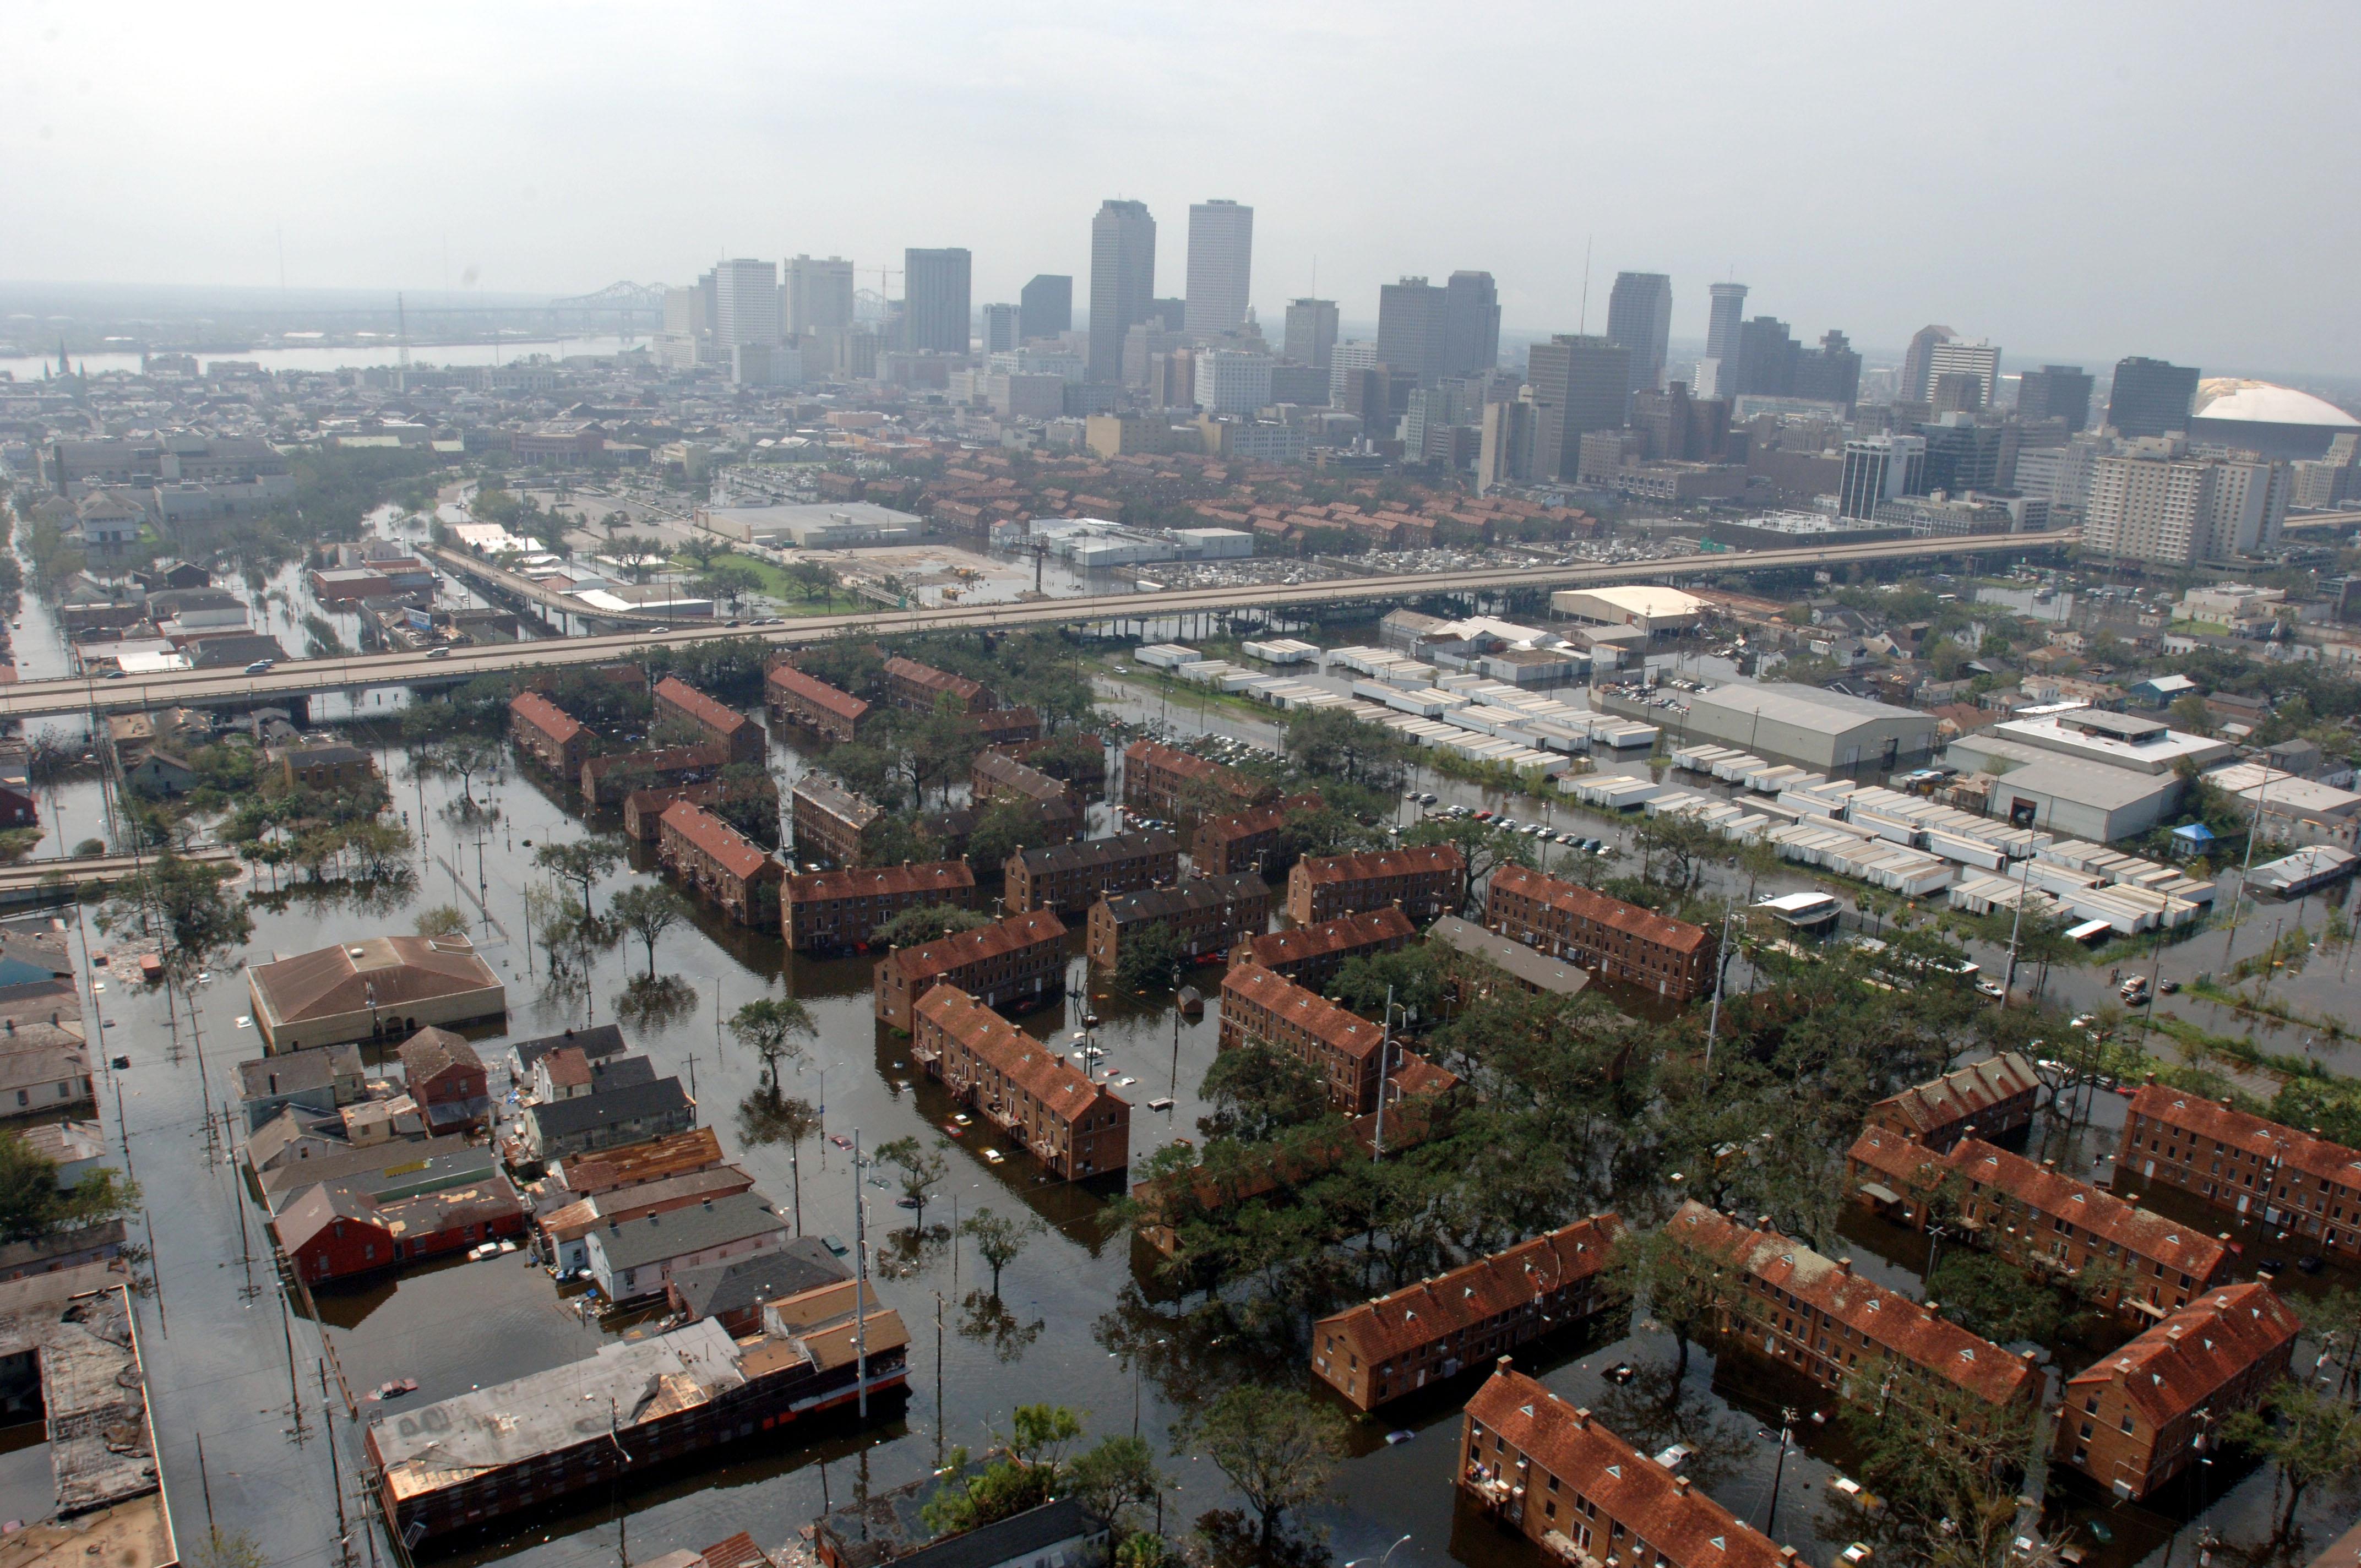 Hurricane Katrina caused over $80 billion of storm and flood damage